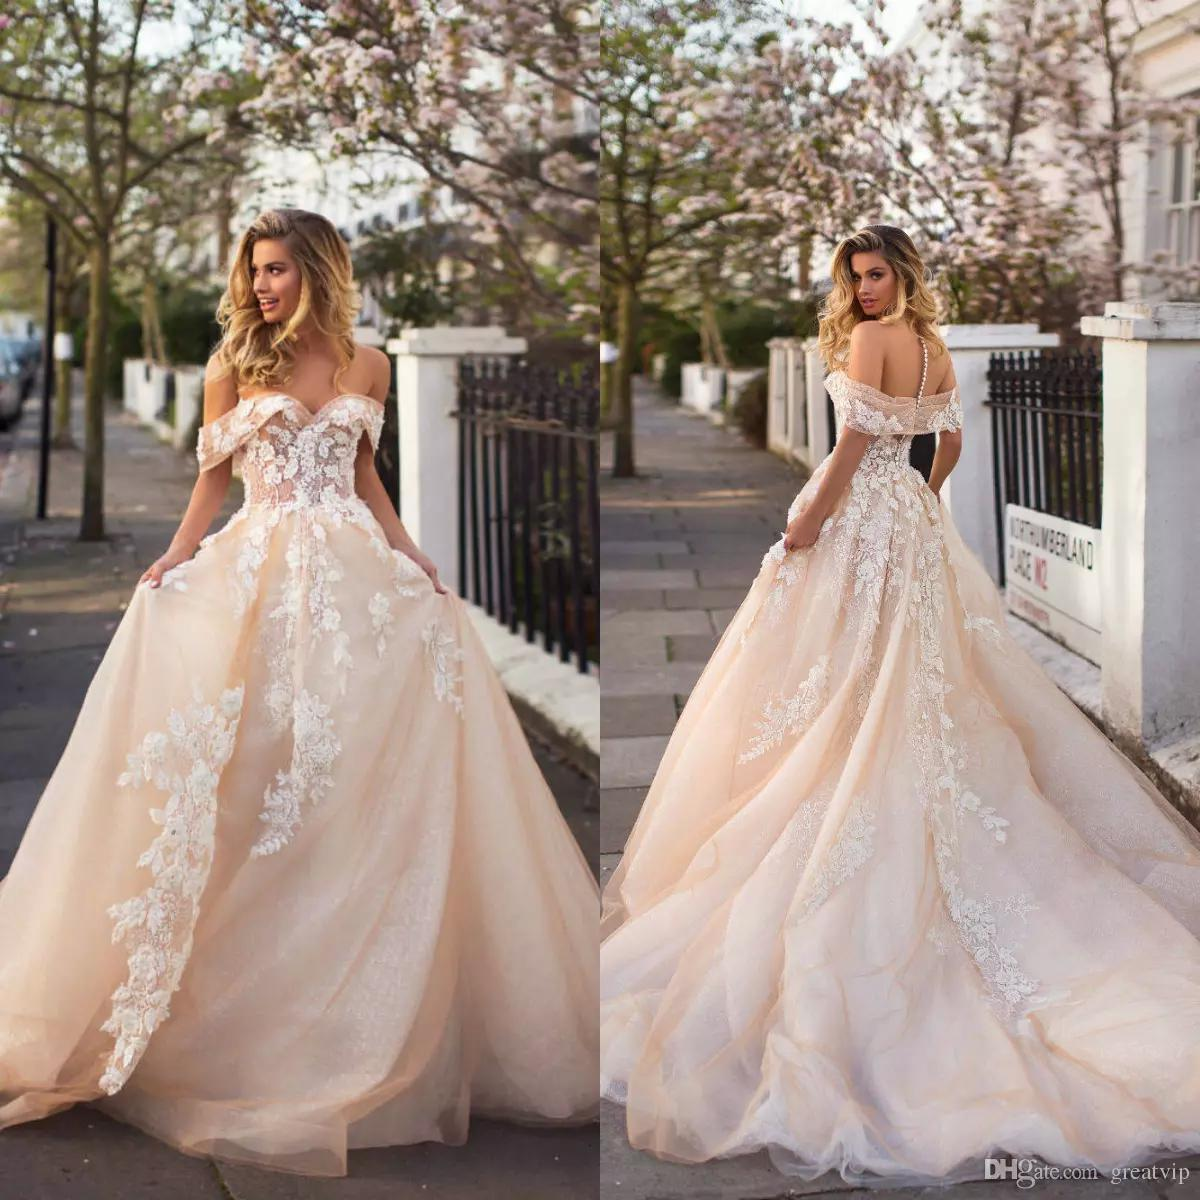 Pin on * Latest Wedding Dresses & More